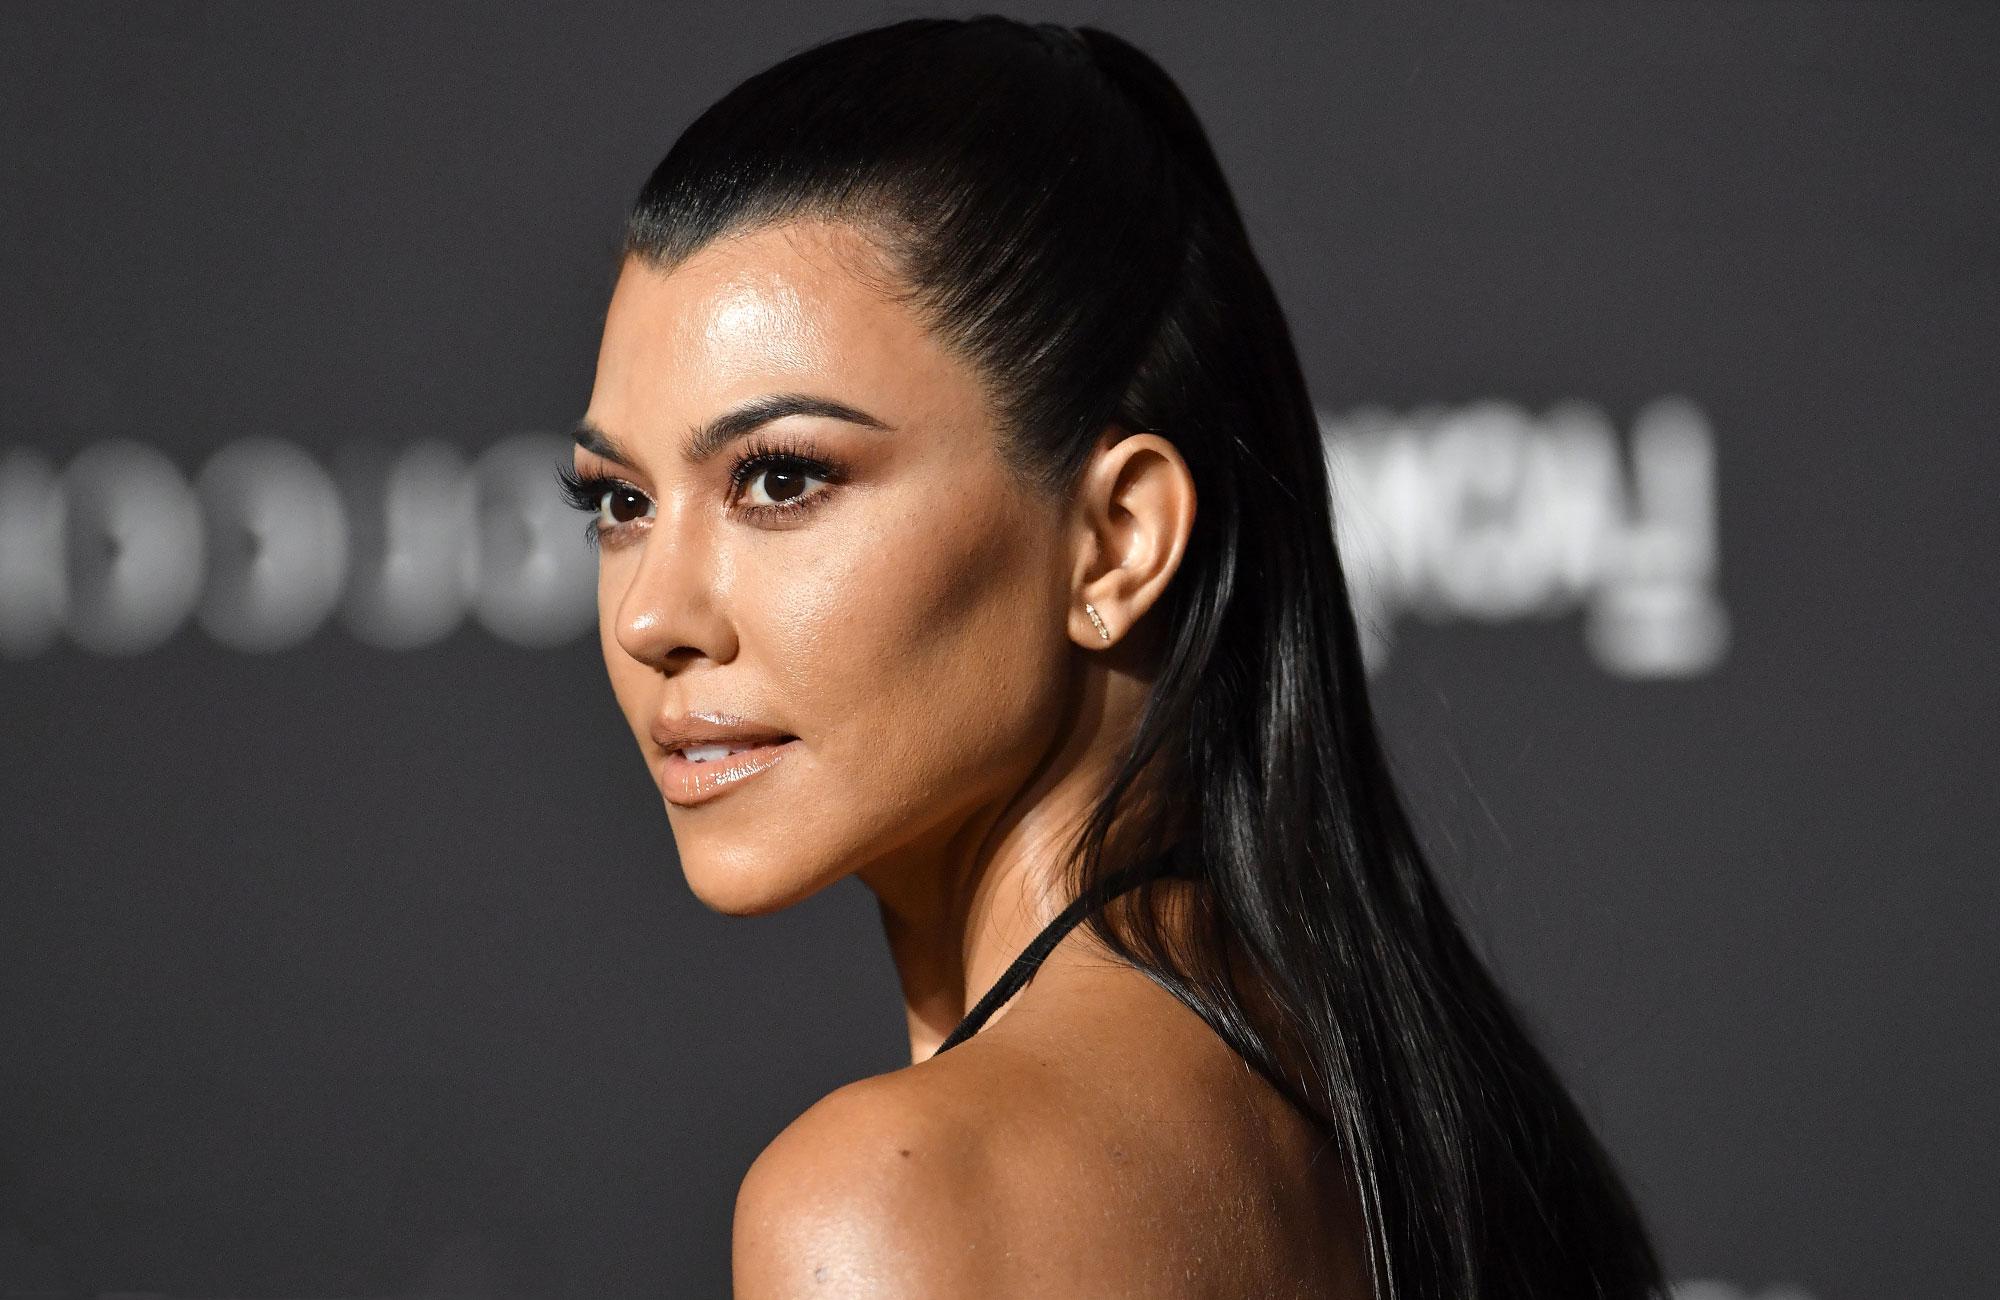 Tribute to Kourtney Kardashian on Her 40th Birthday - Kourtney Kardashian